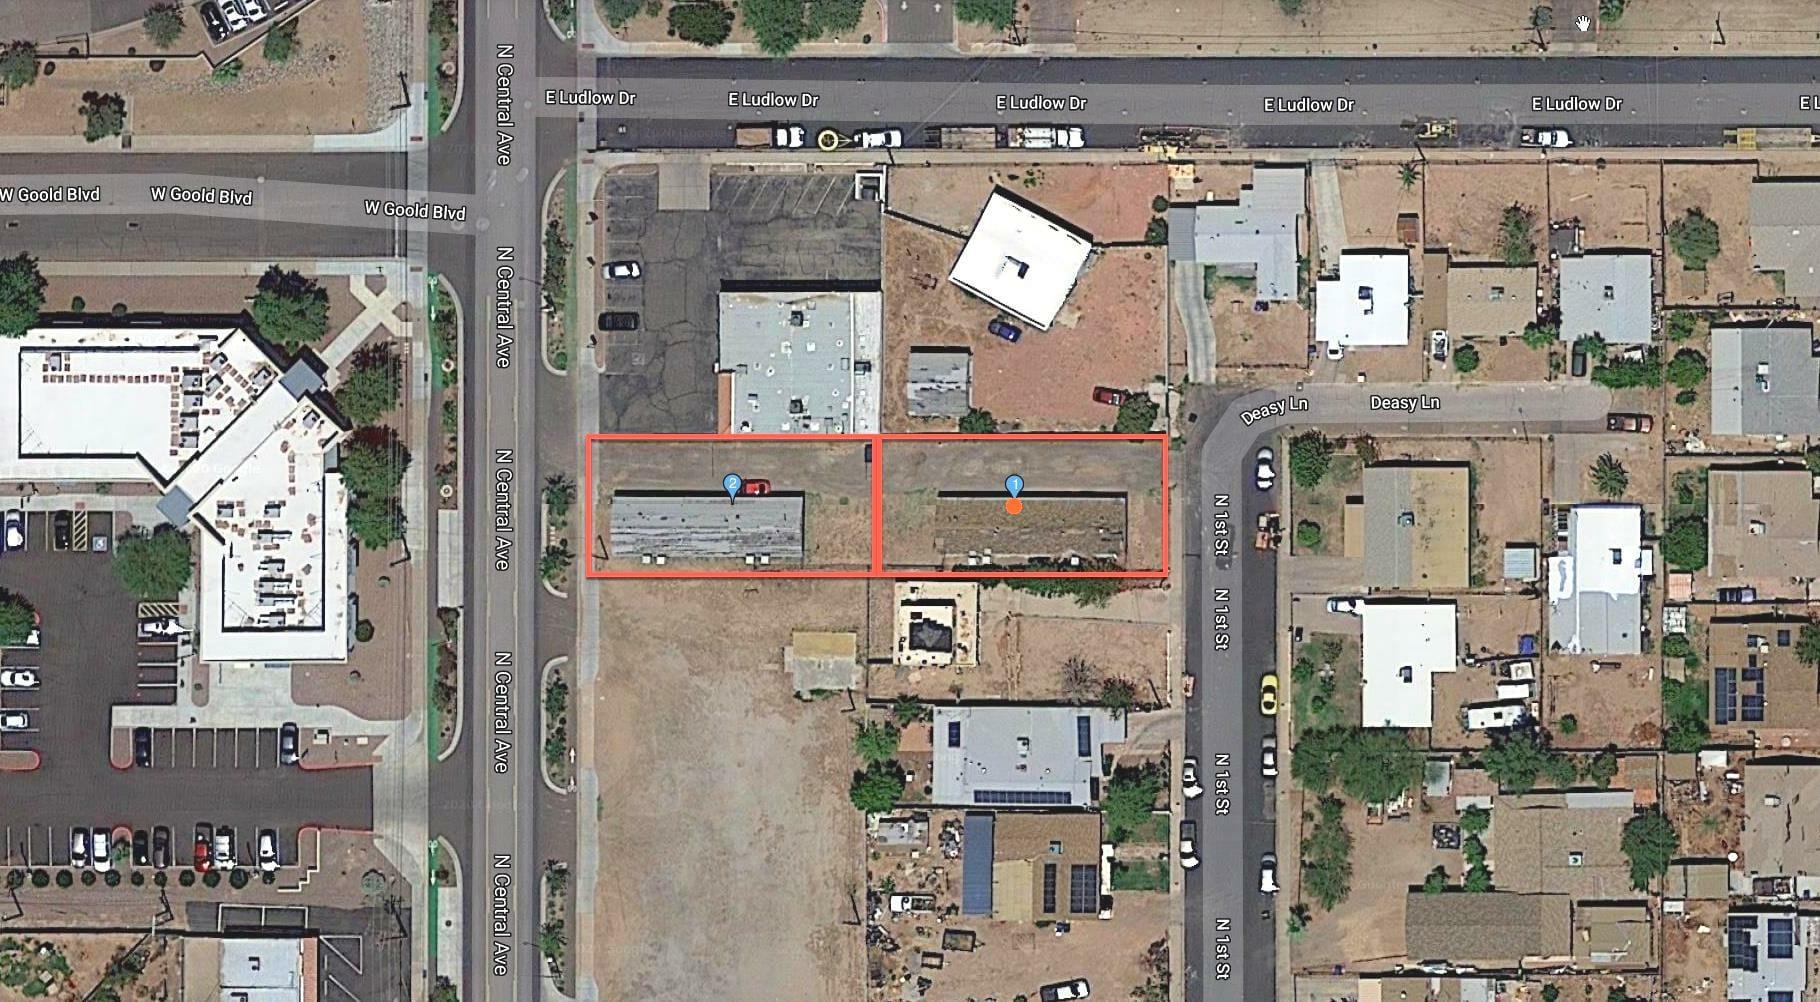 336 N 1st St, Avondale, AZ 85323